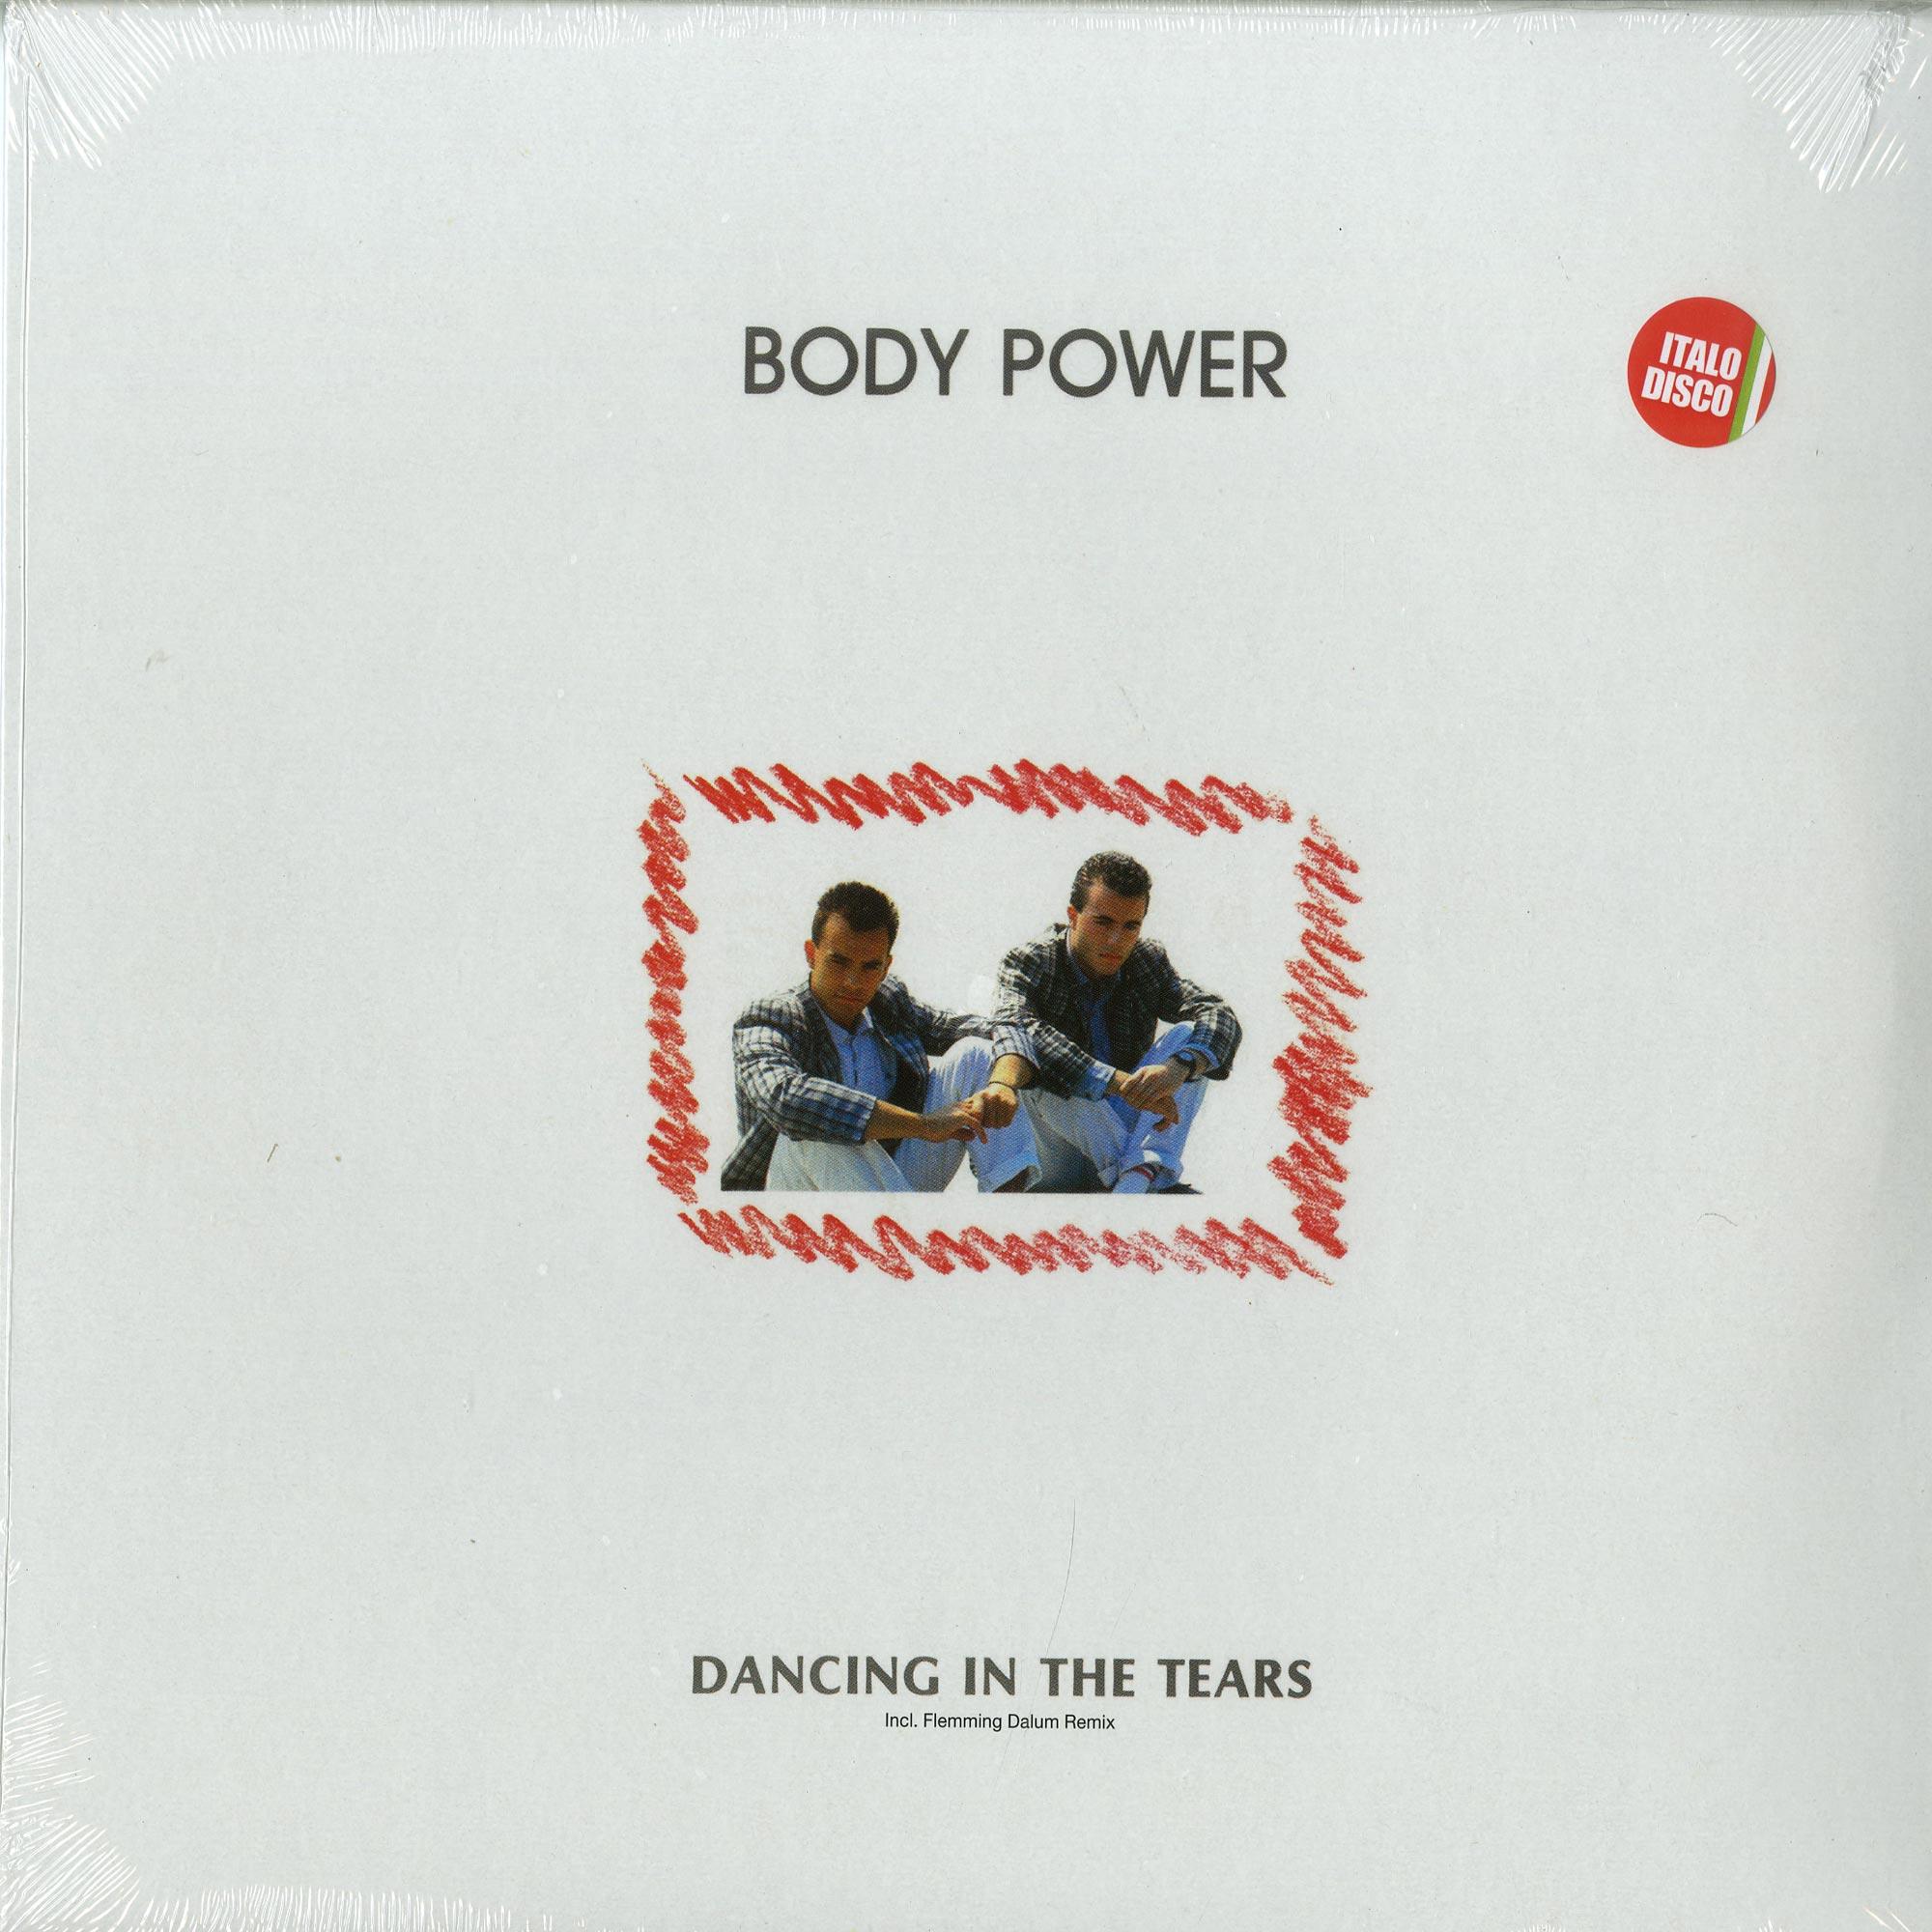 Body Power - DANCING IN THE TEARS